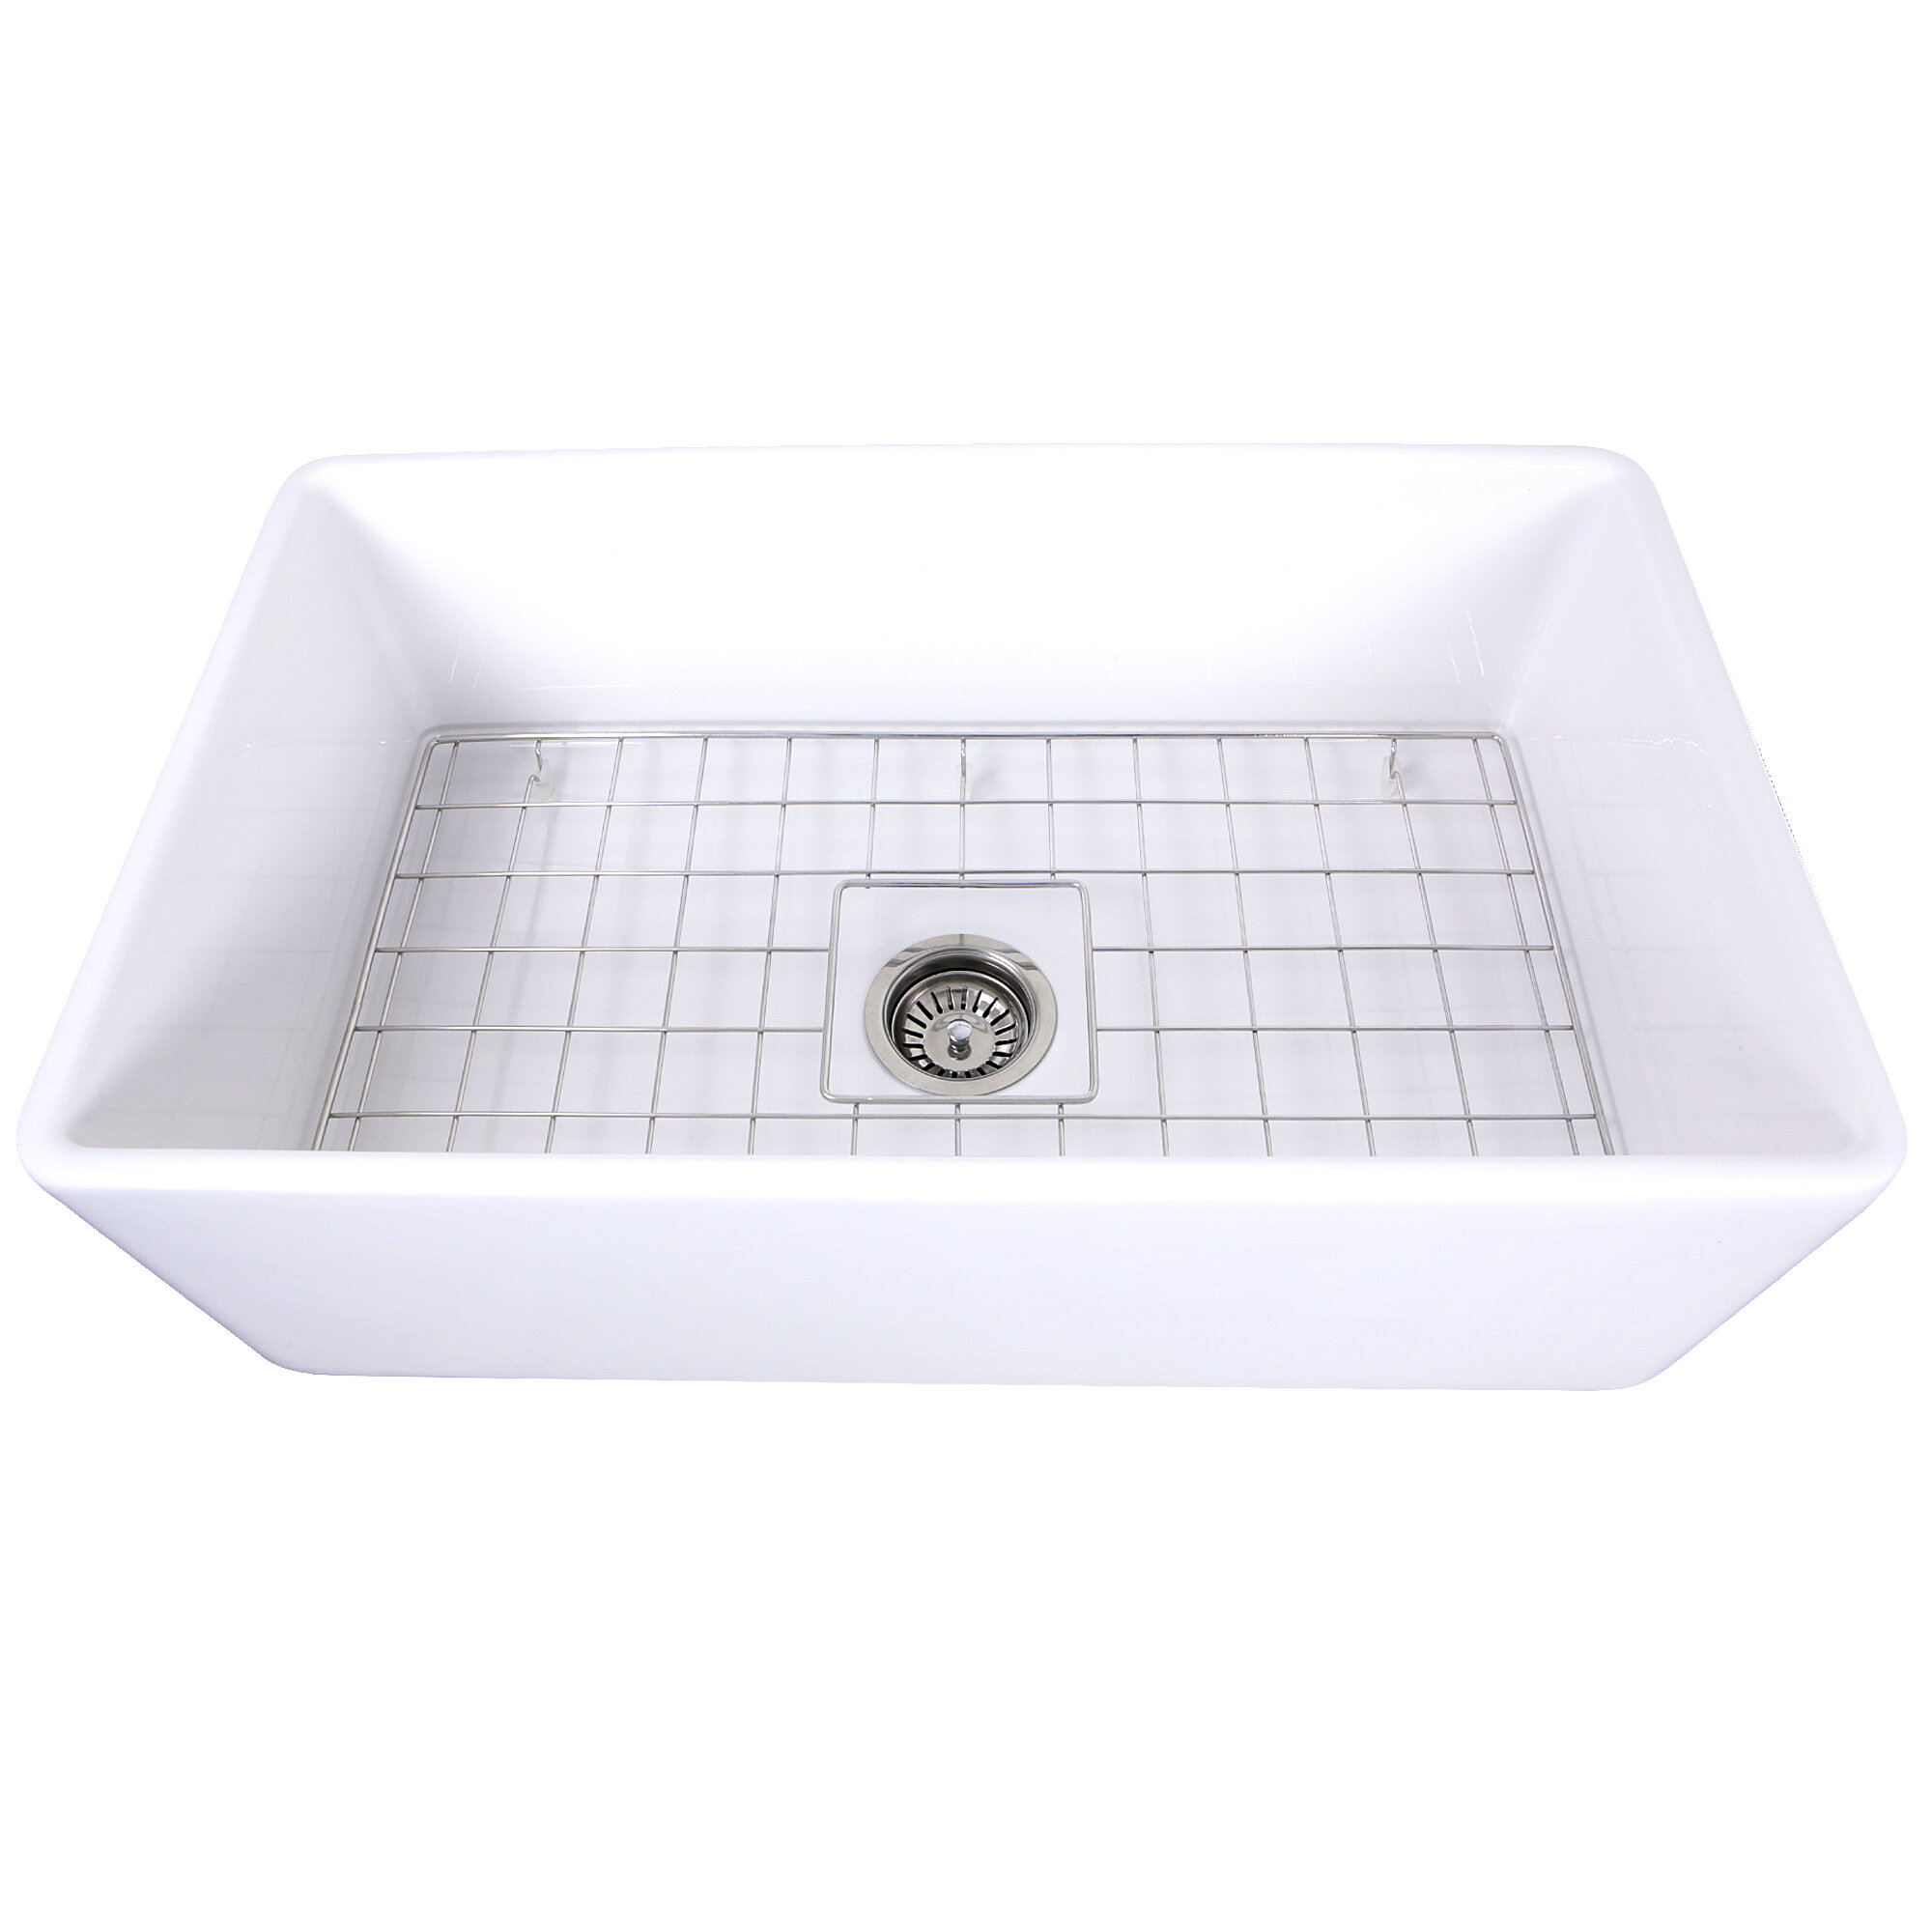 Cape 30 L X 18 W Farmhouse Kitchen Sink With Grid Reviews Joss Main